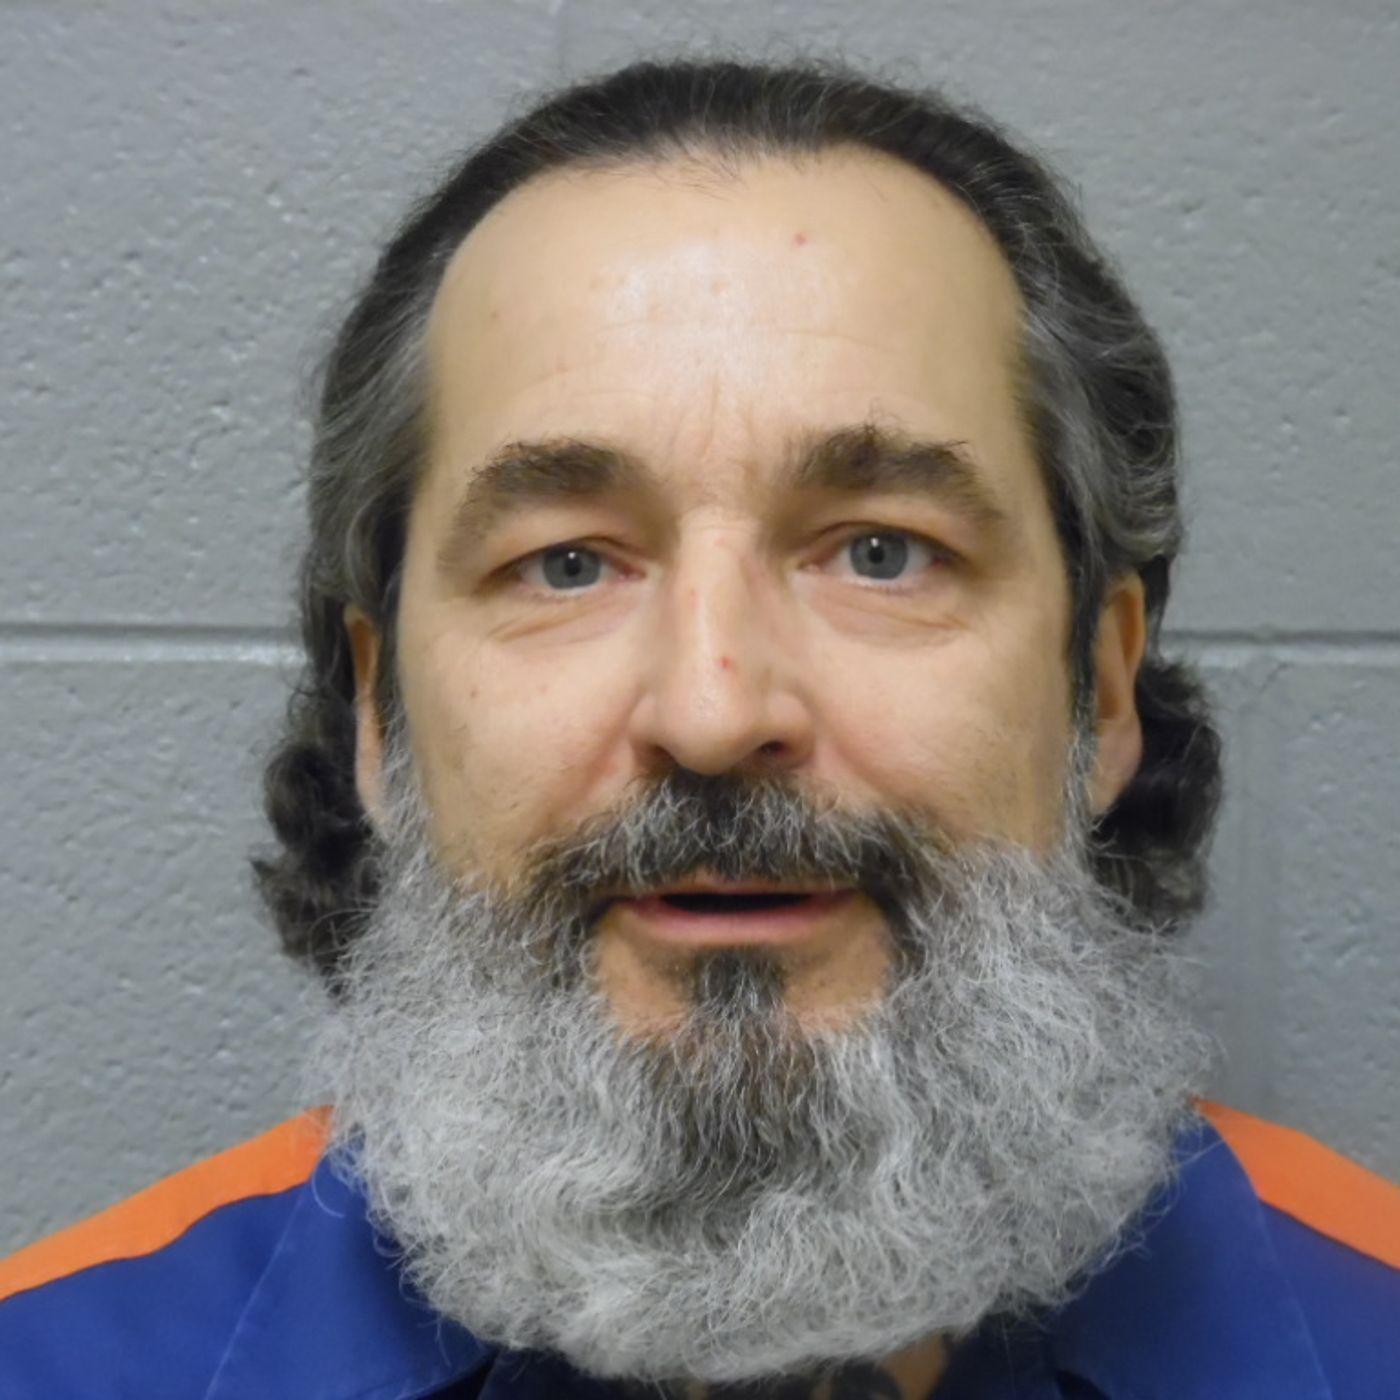 Interview with Michigan triple murderer John Jancar Jr.